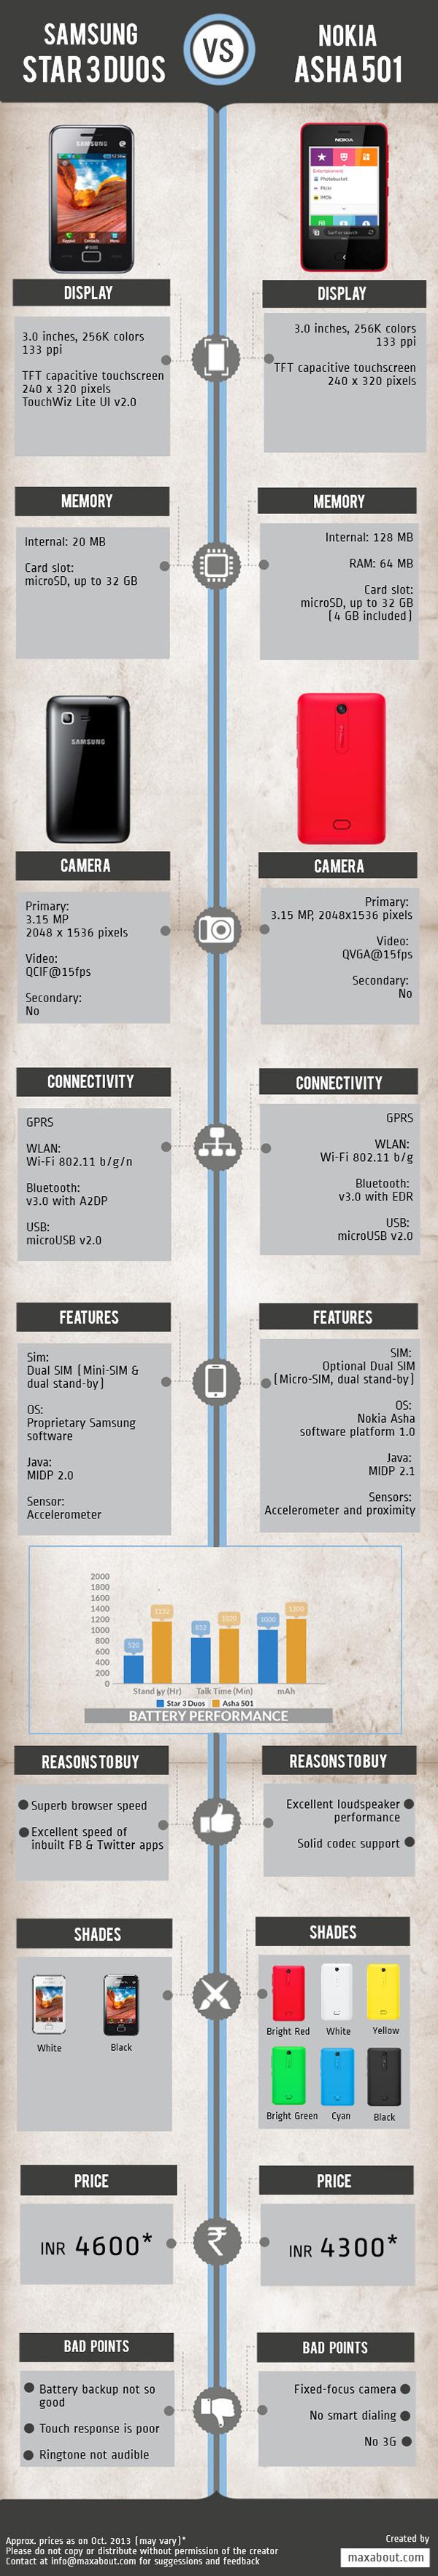 Nokia Asha vs Samsung Star